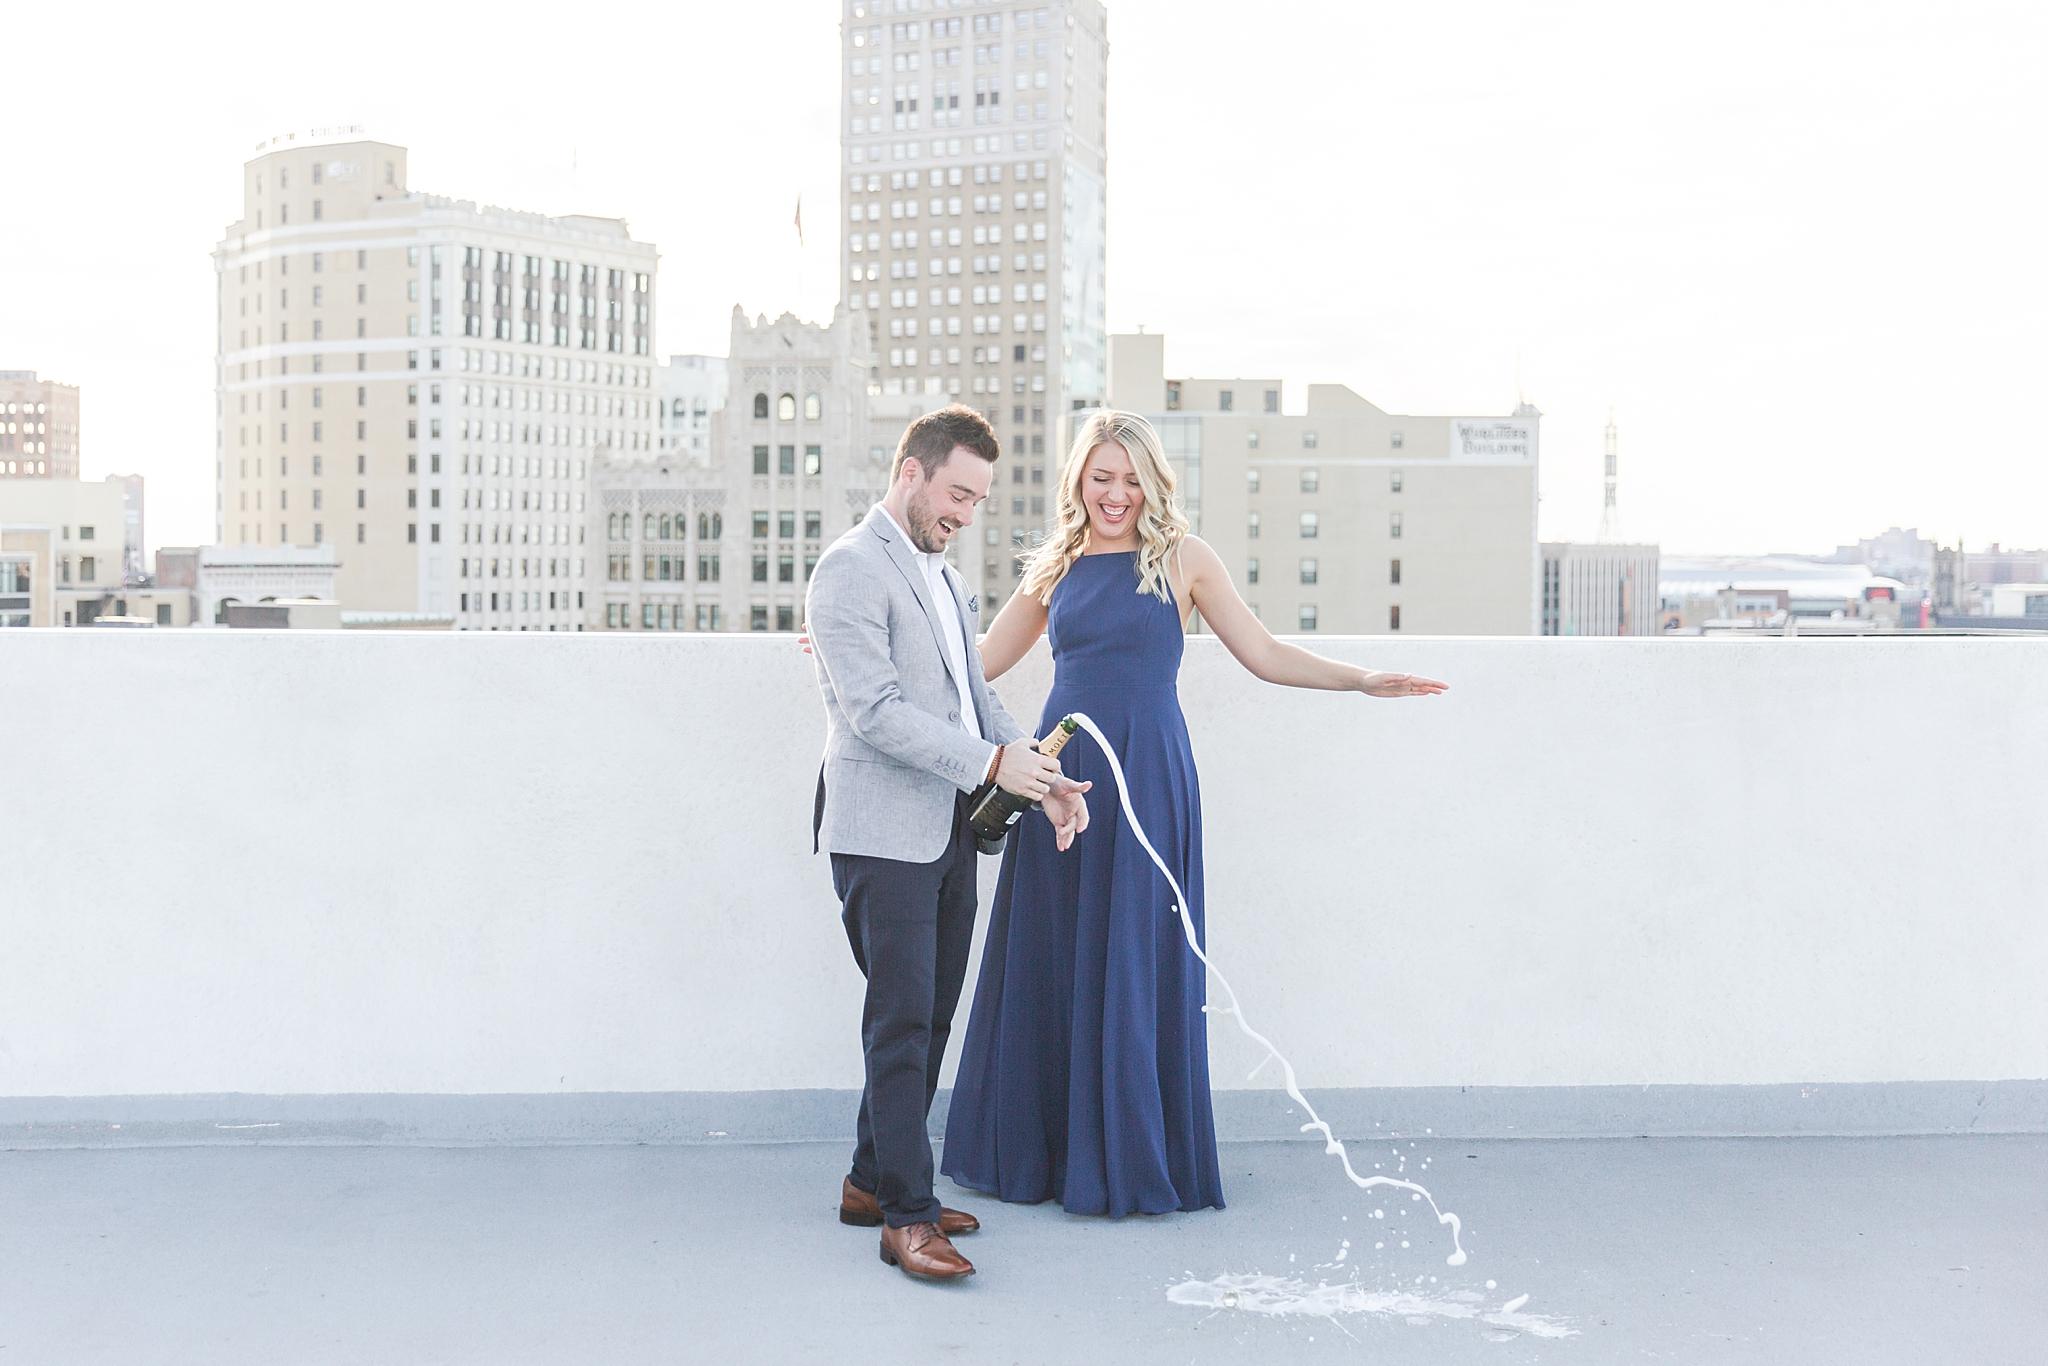 detroit-wedding-photographer-downtown-detroit-belle-isle-engagement-photos-sarah-eric-by-courtney-carolyn-photography_0007.jpg